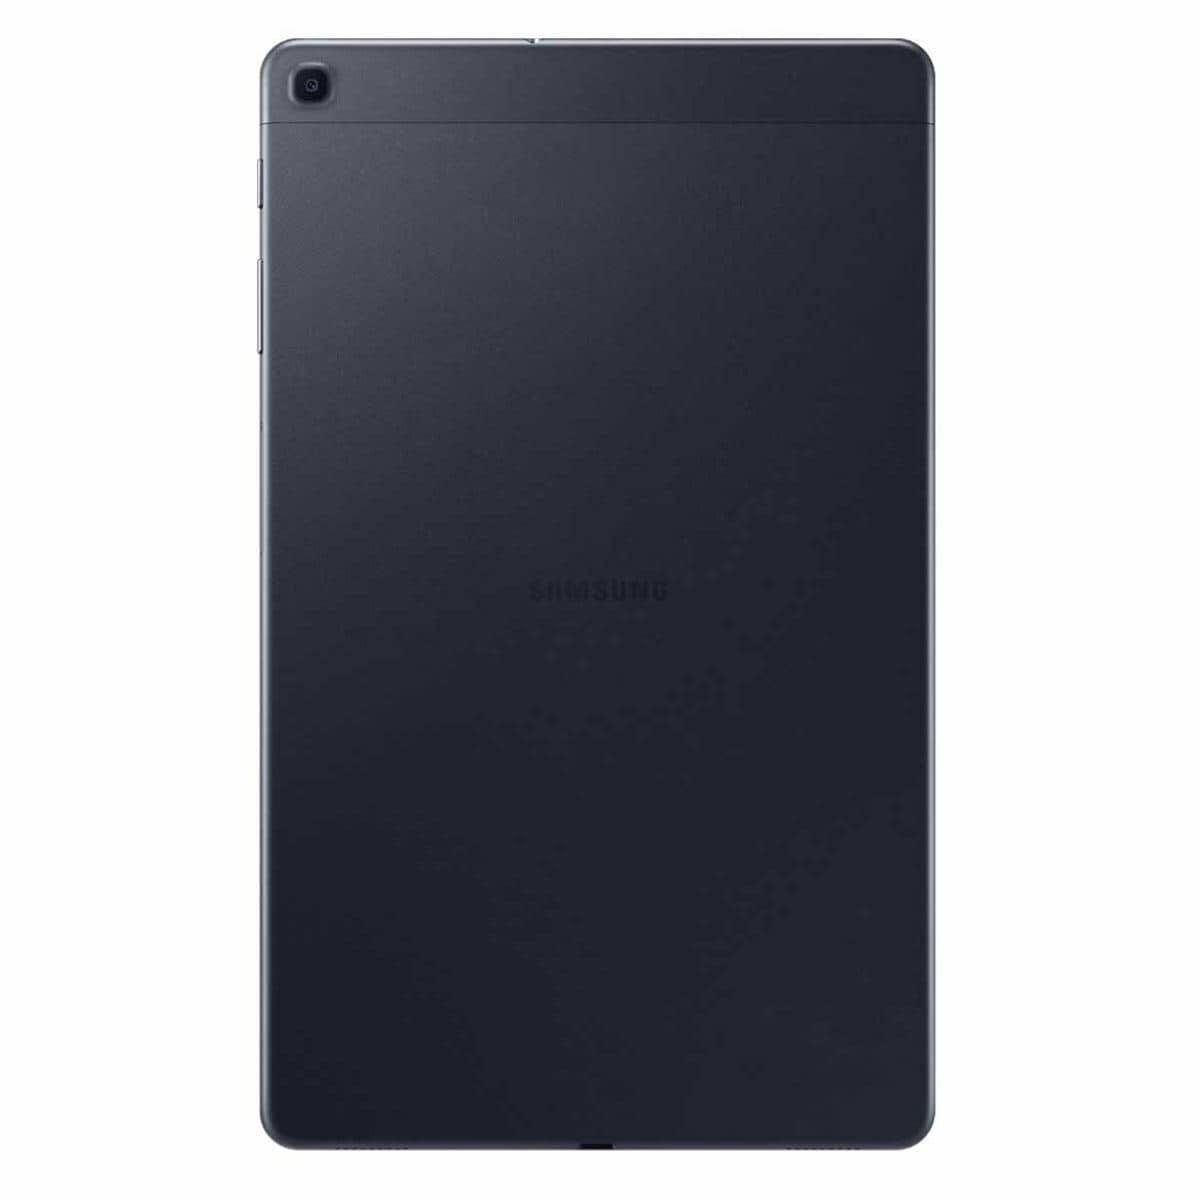 Samsung Galaxy Tab A 10.1 Negra